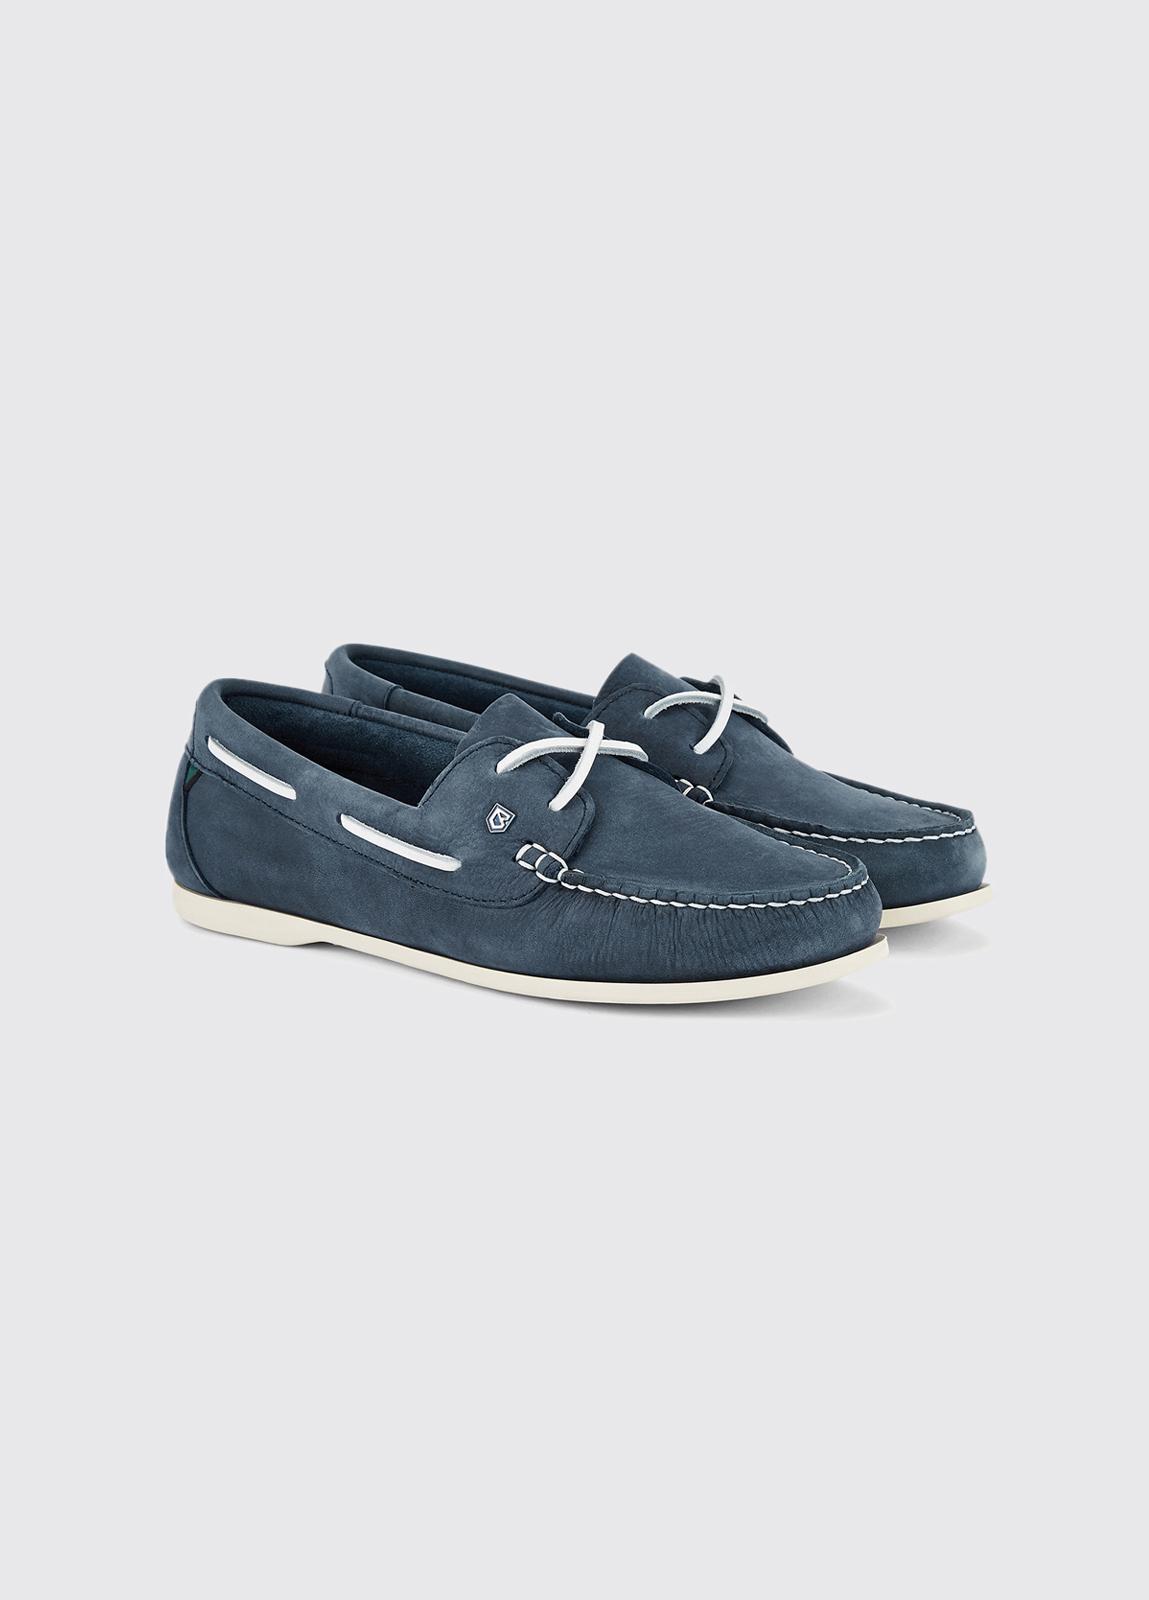 Aruba Deck Shoe - Teal